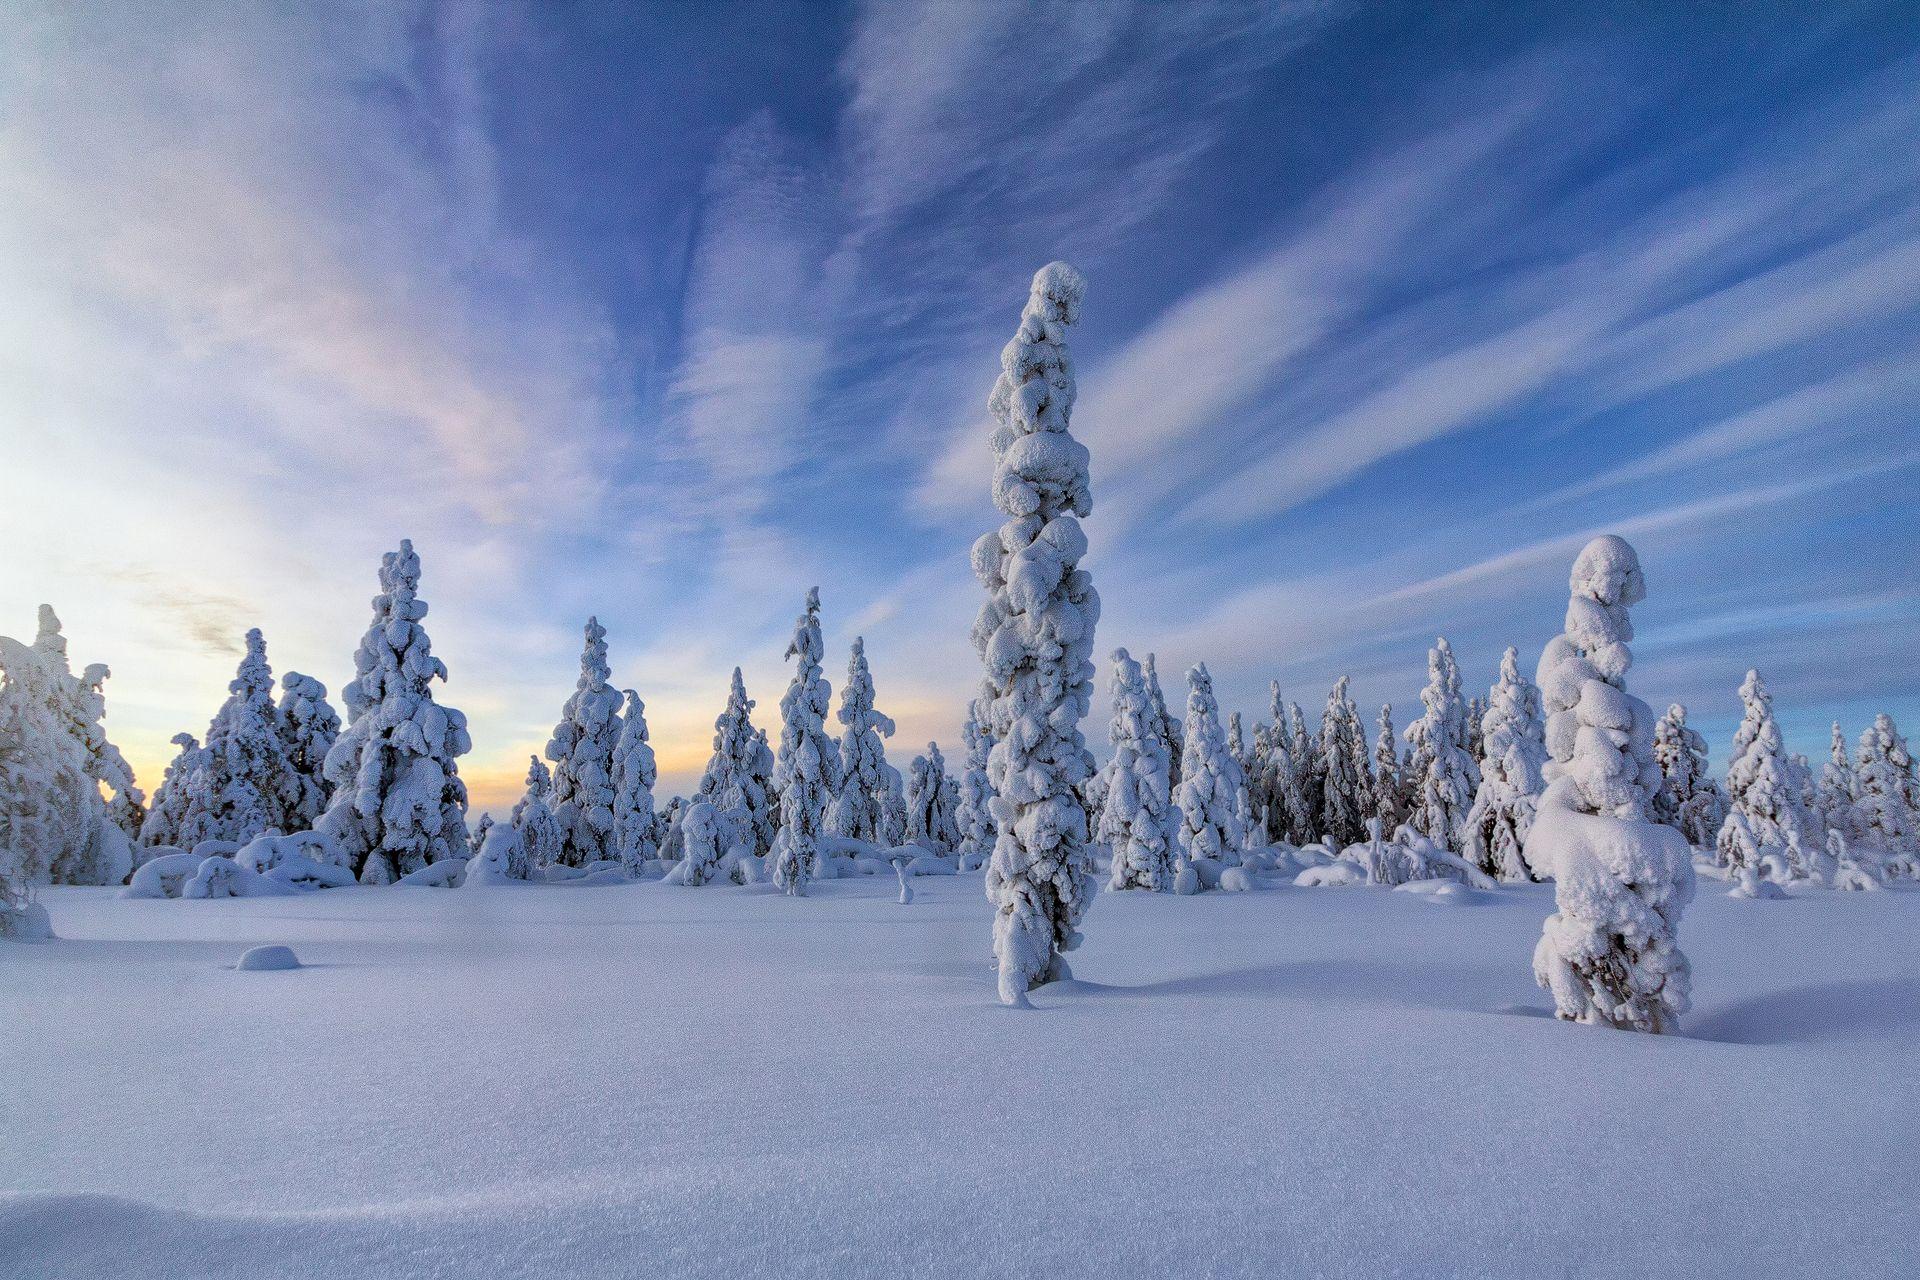 snow trees, winterwonderland, ice, sunset, coverd in snow, snow forest